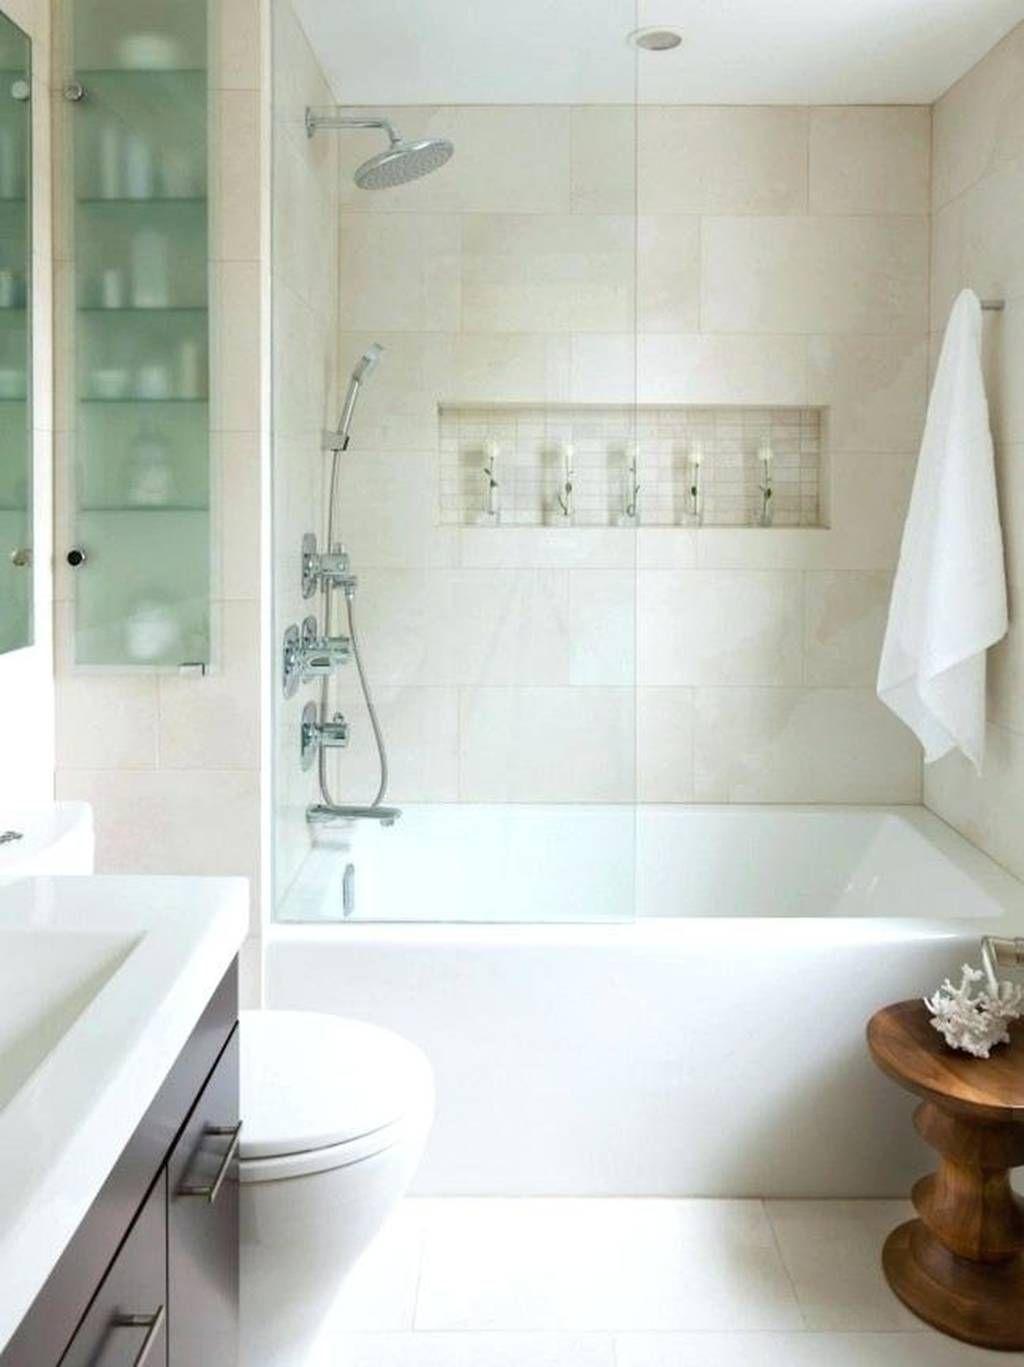 Bathtub Options Small Bathroom Very Deep Bathtubs For